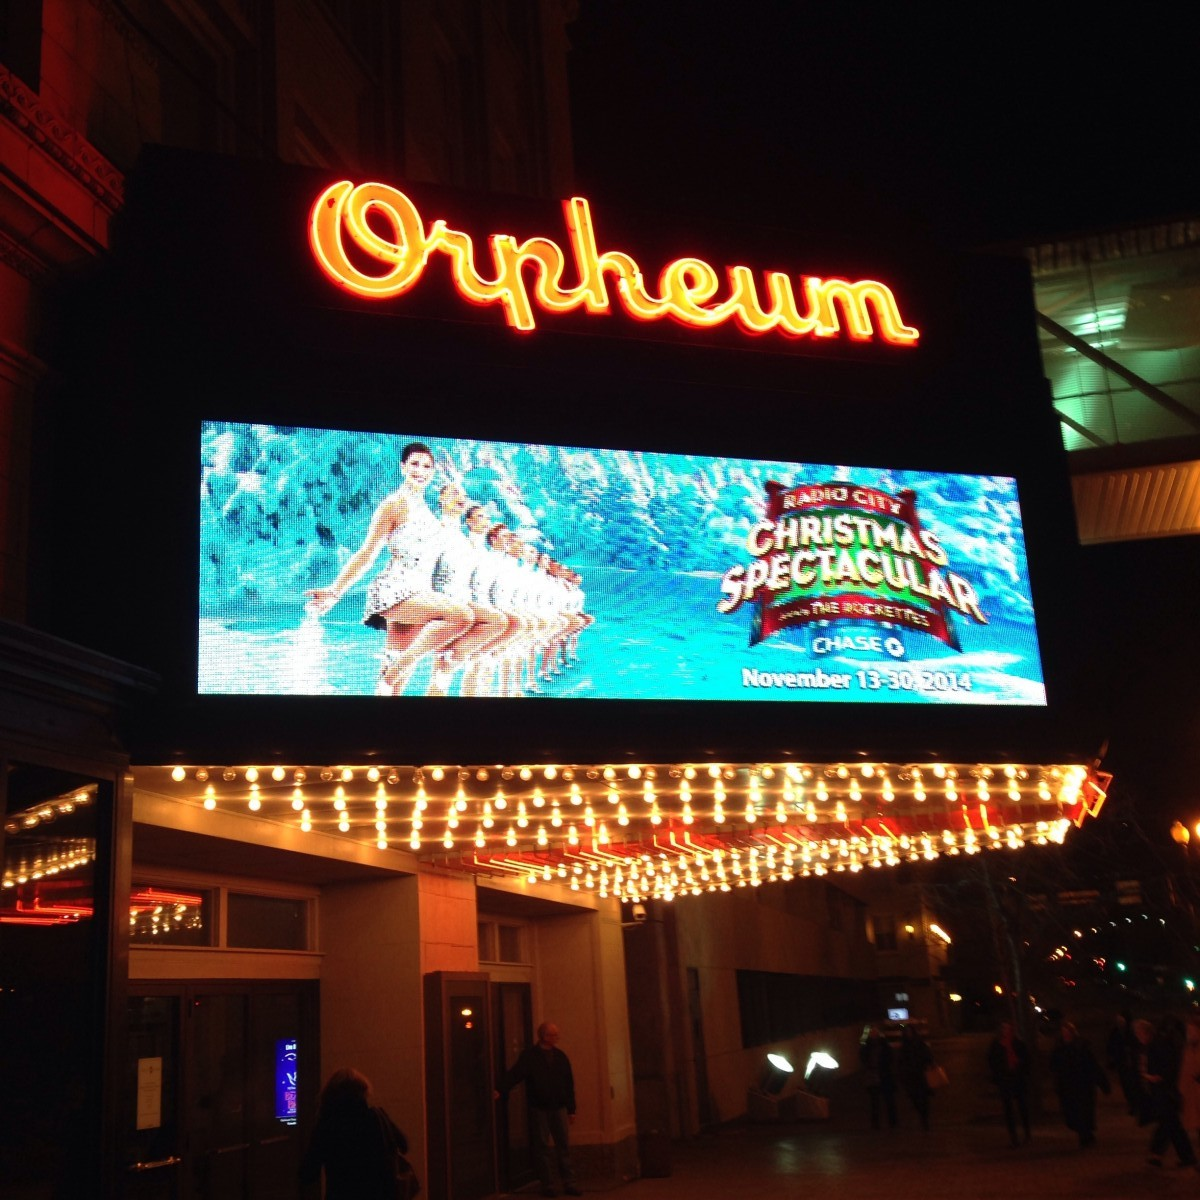 Orpheum Theater Rockettes Omaha Erin Fairchild Her Heartland Soul